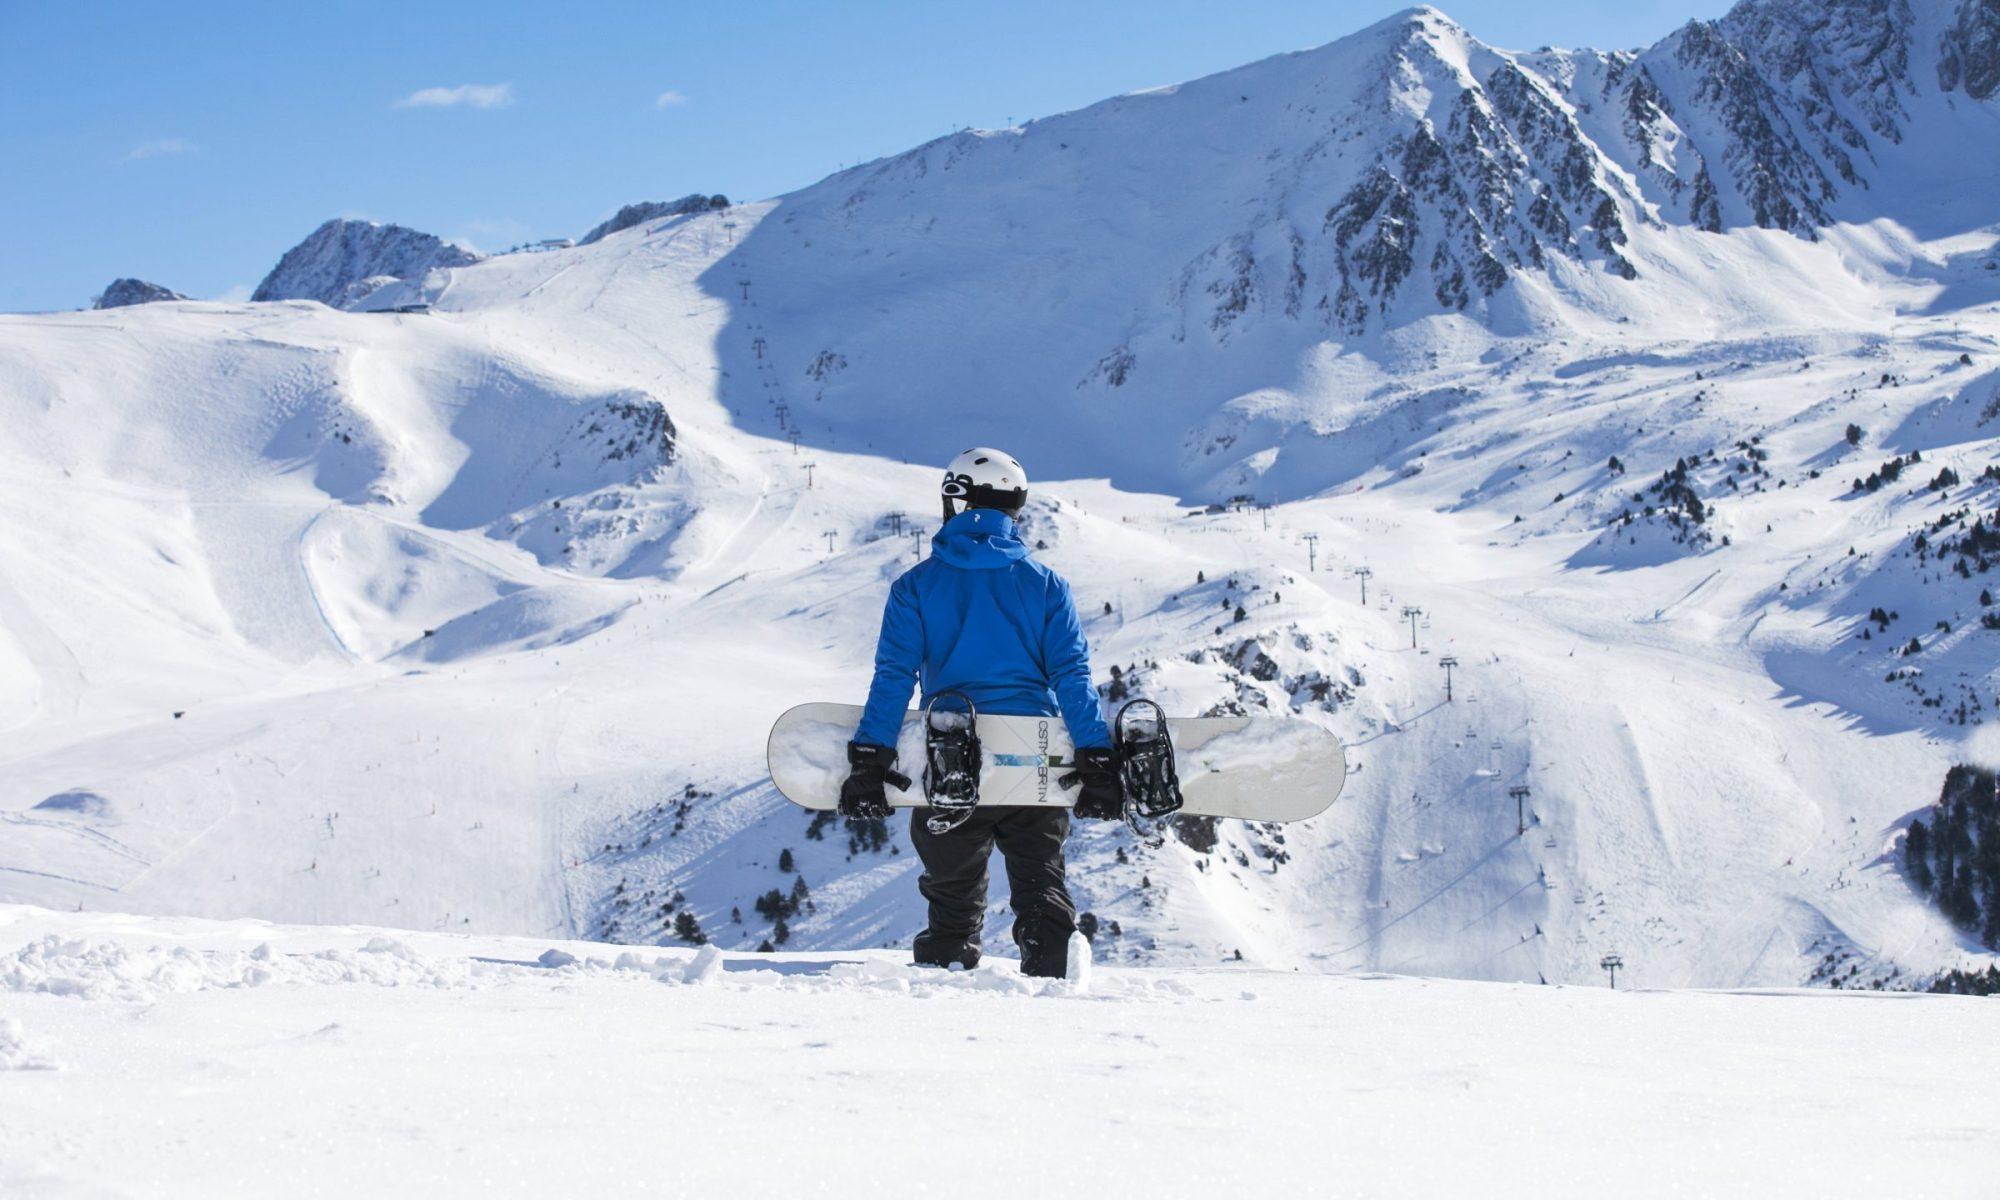 Continuity of Grandvalira guaranteed for the long term with the addition of Ordino Arcalís to their skiing experience. - Photo: Grandvalira.